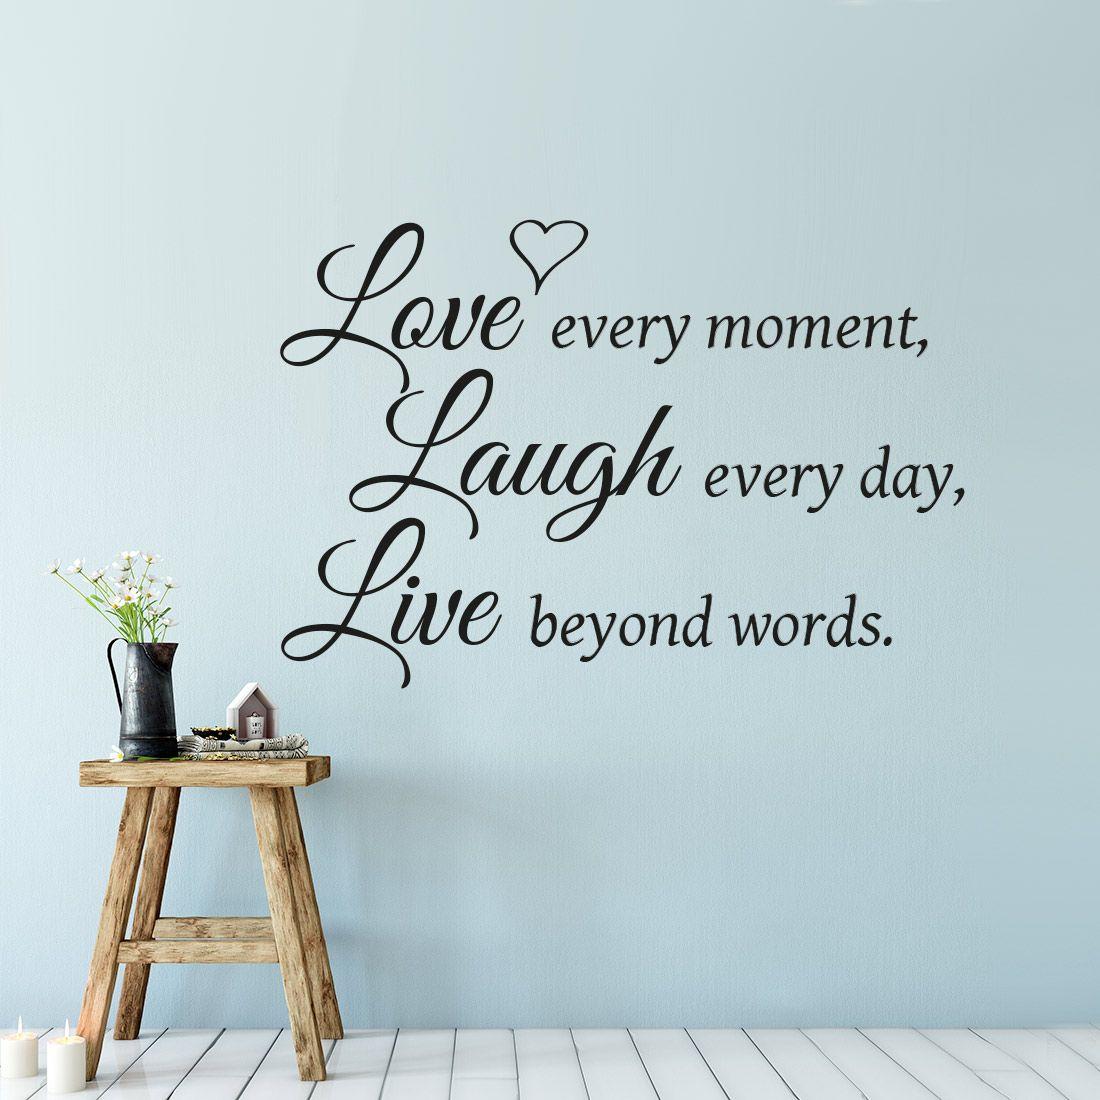 Love laugh live muursticker | Pinterest - Muurstickers, Muur en ...